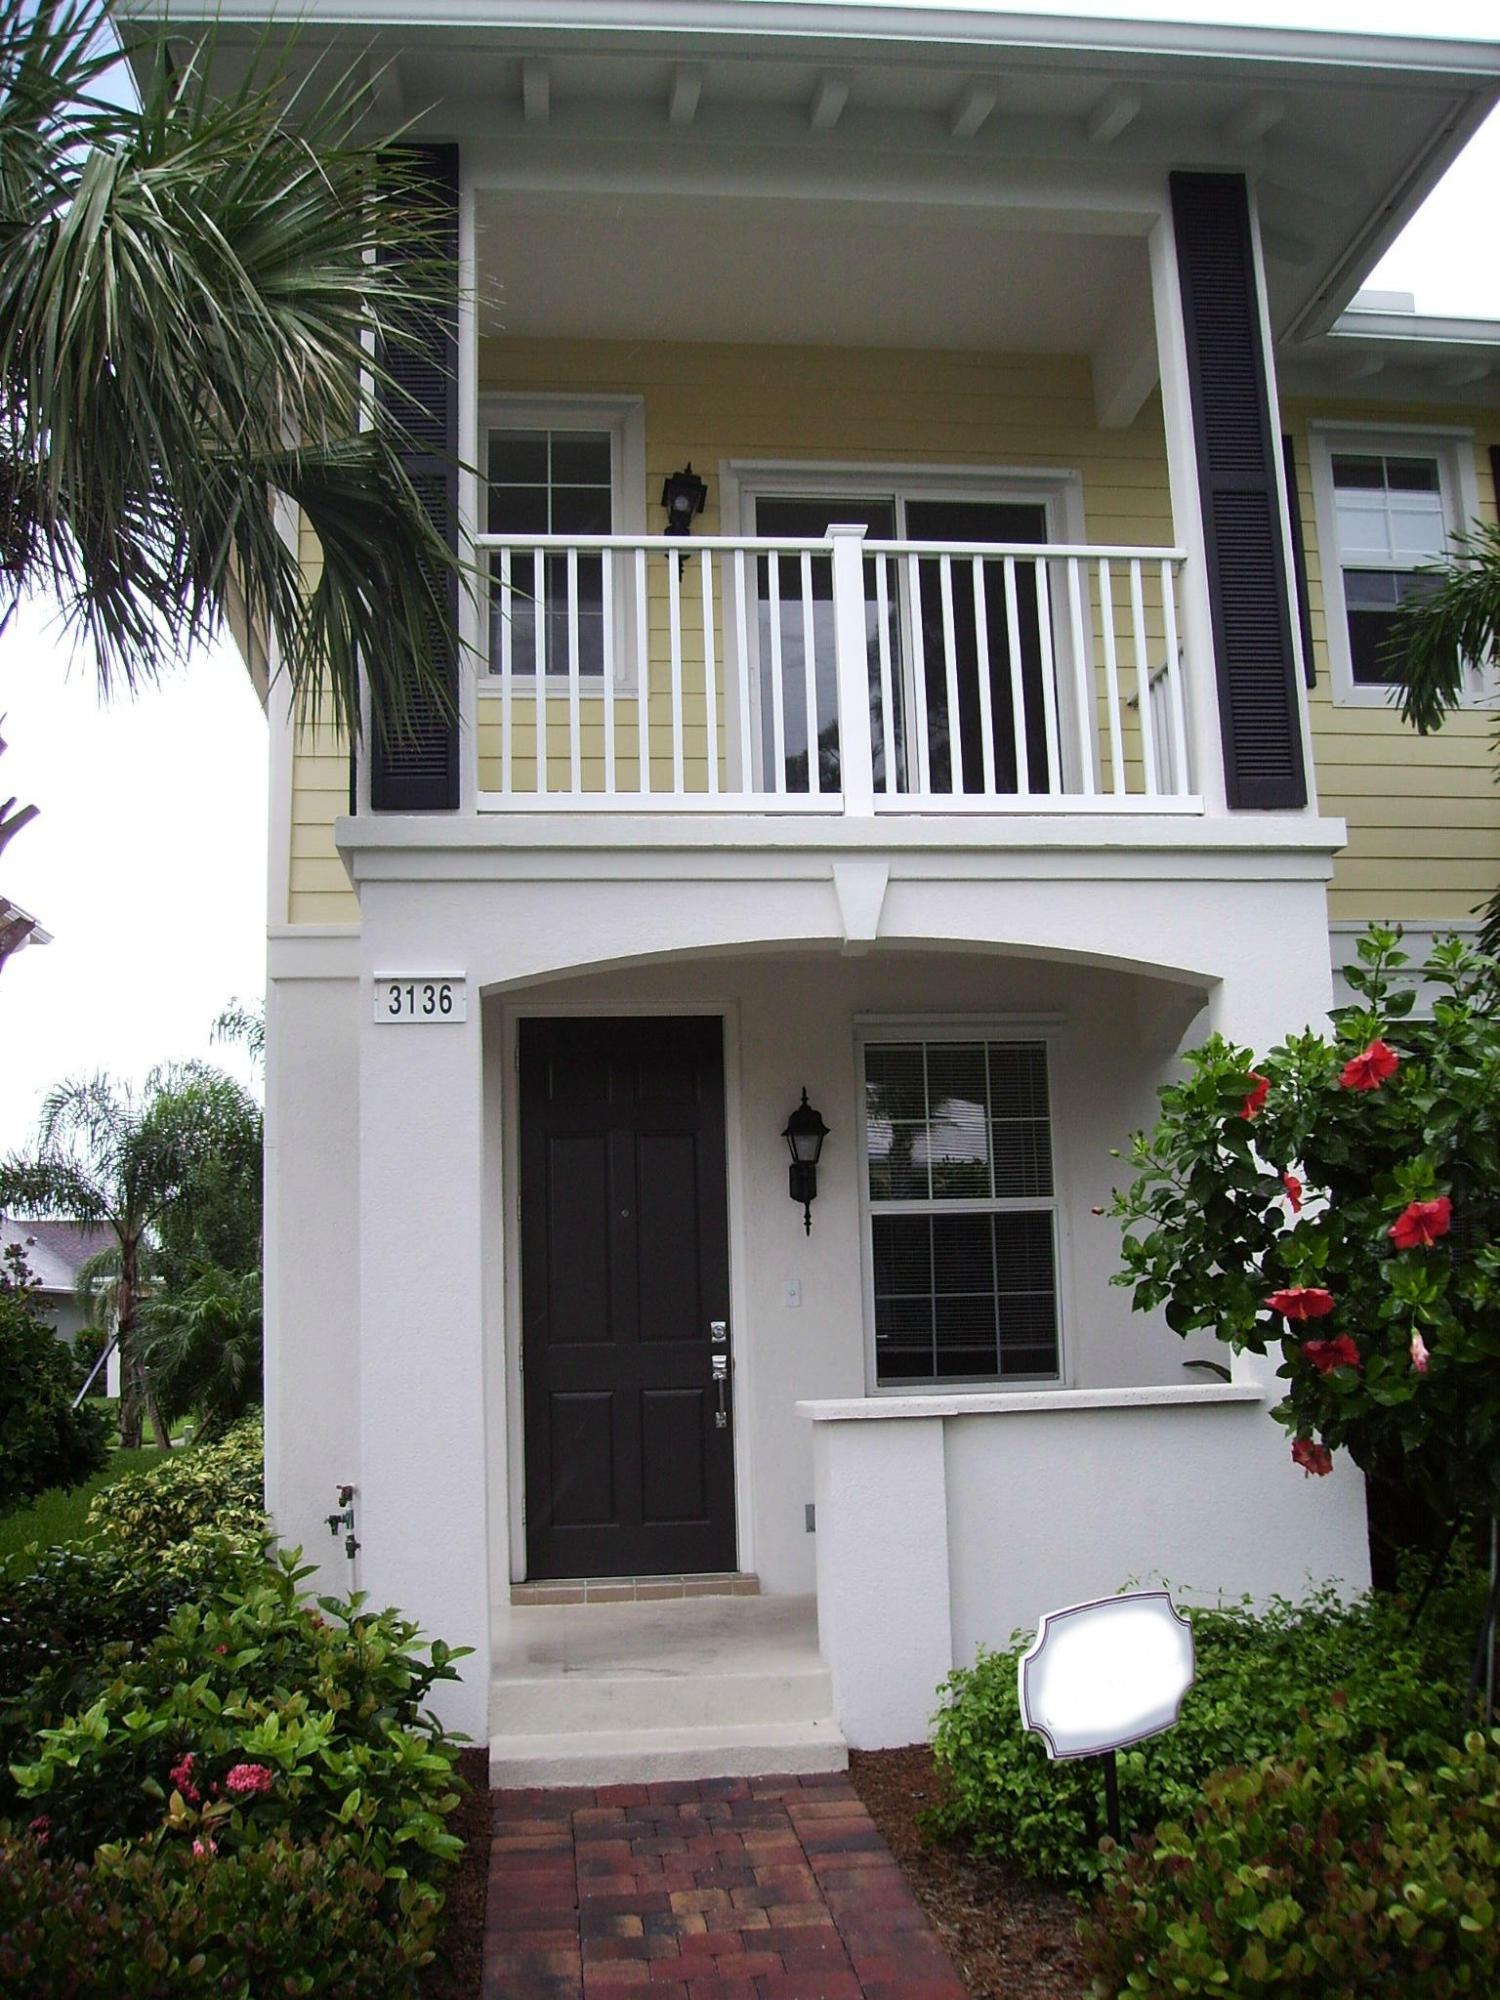 3136 Community Drive, Jupiter, Florida 33458, 3 Bedrooms Bedrooms, ,2.1 BathroomsBathrooms,F,Townhouse,Community,RX-10520993